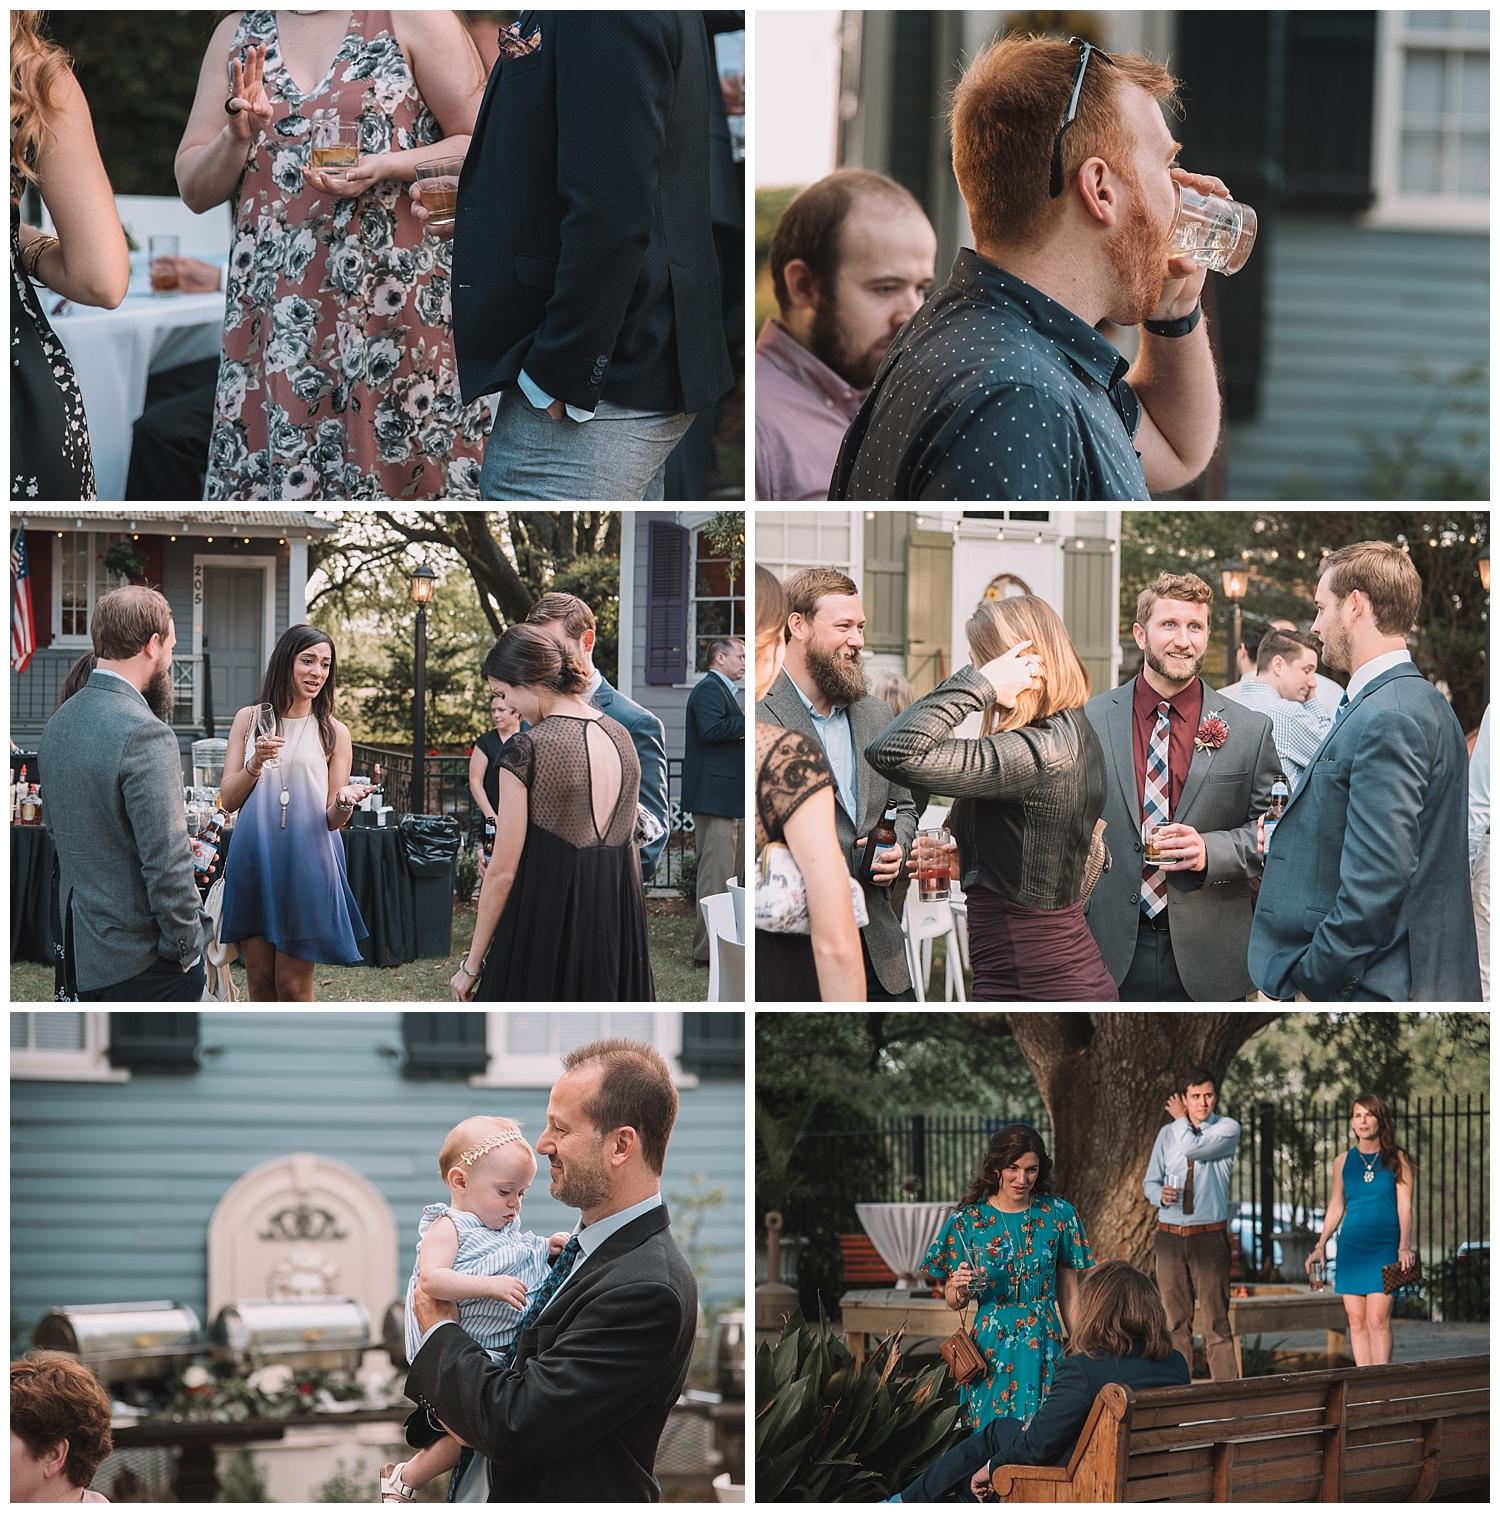 Grace and James Wedding - Compass Point Events - Kallistia Photography_0030.jpg